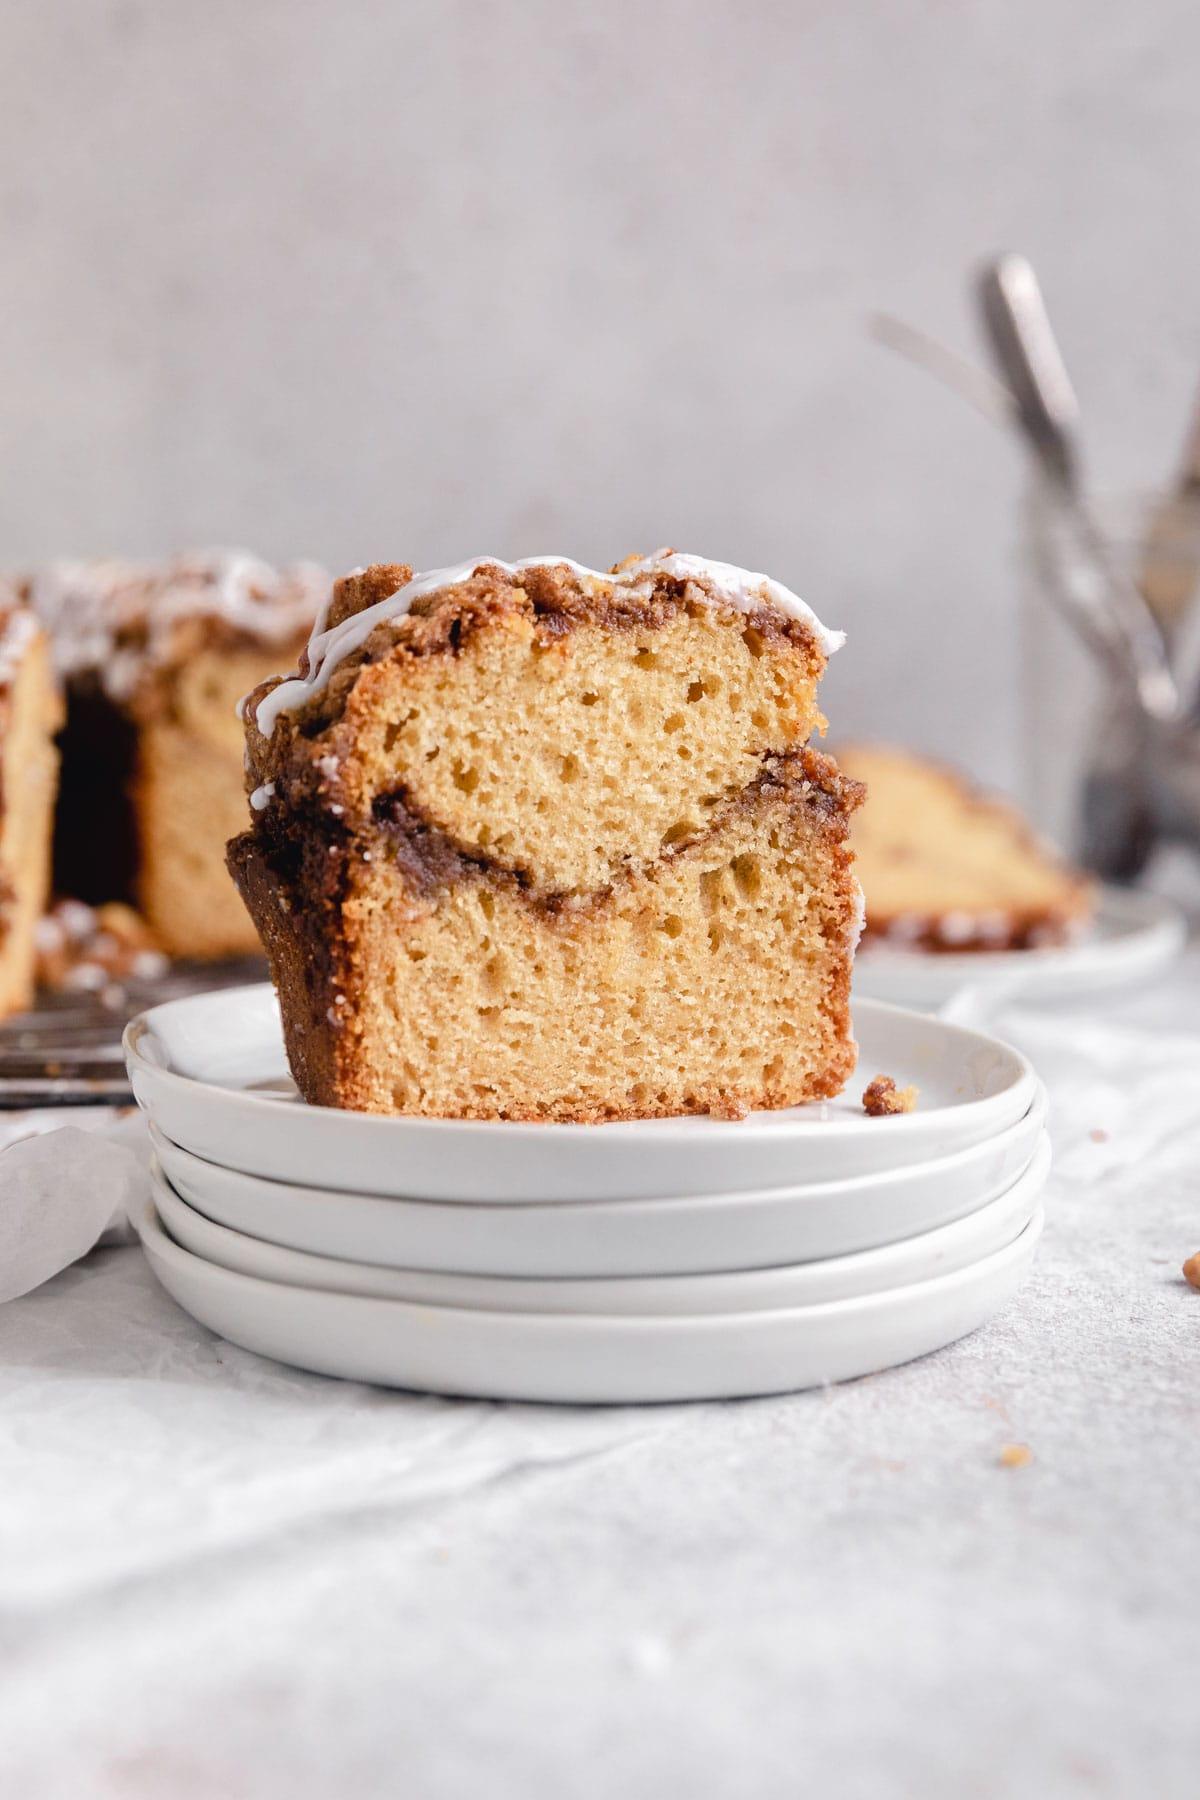 slice of coffee cake with cinnamon sugar swirl